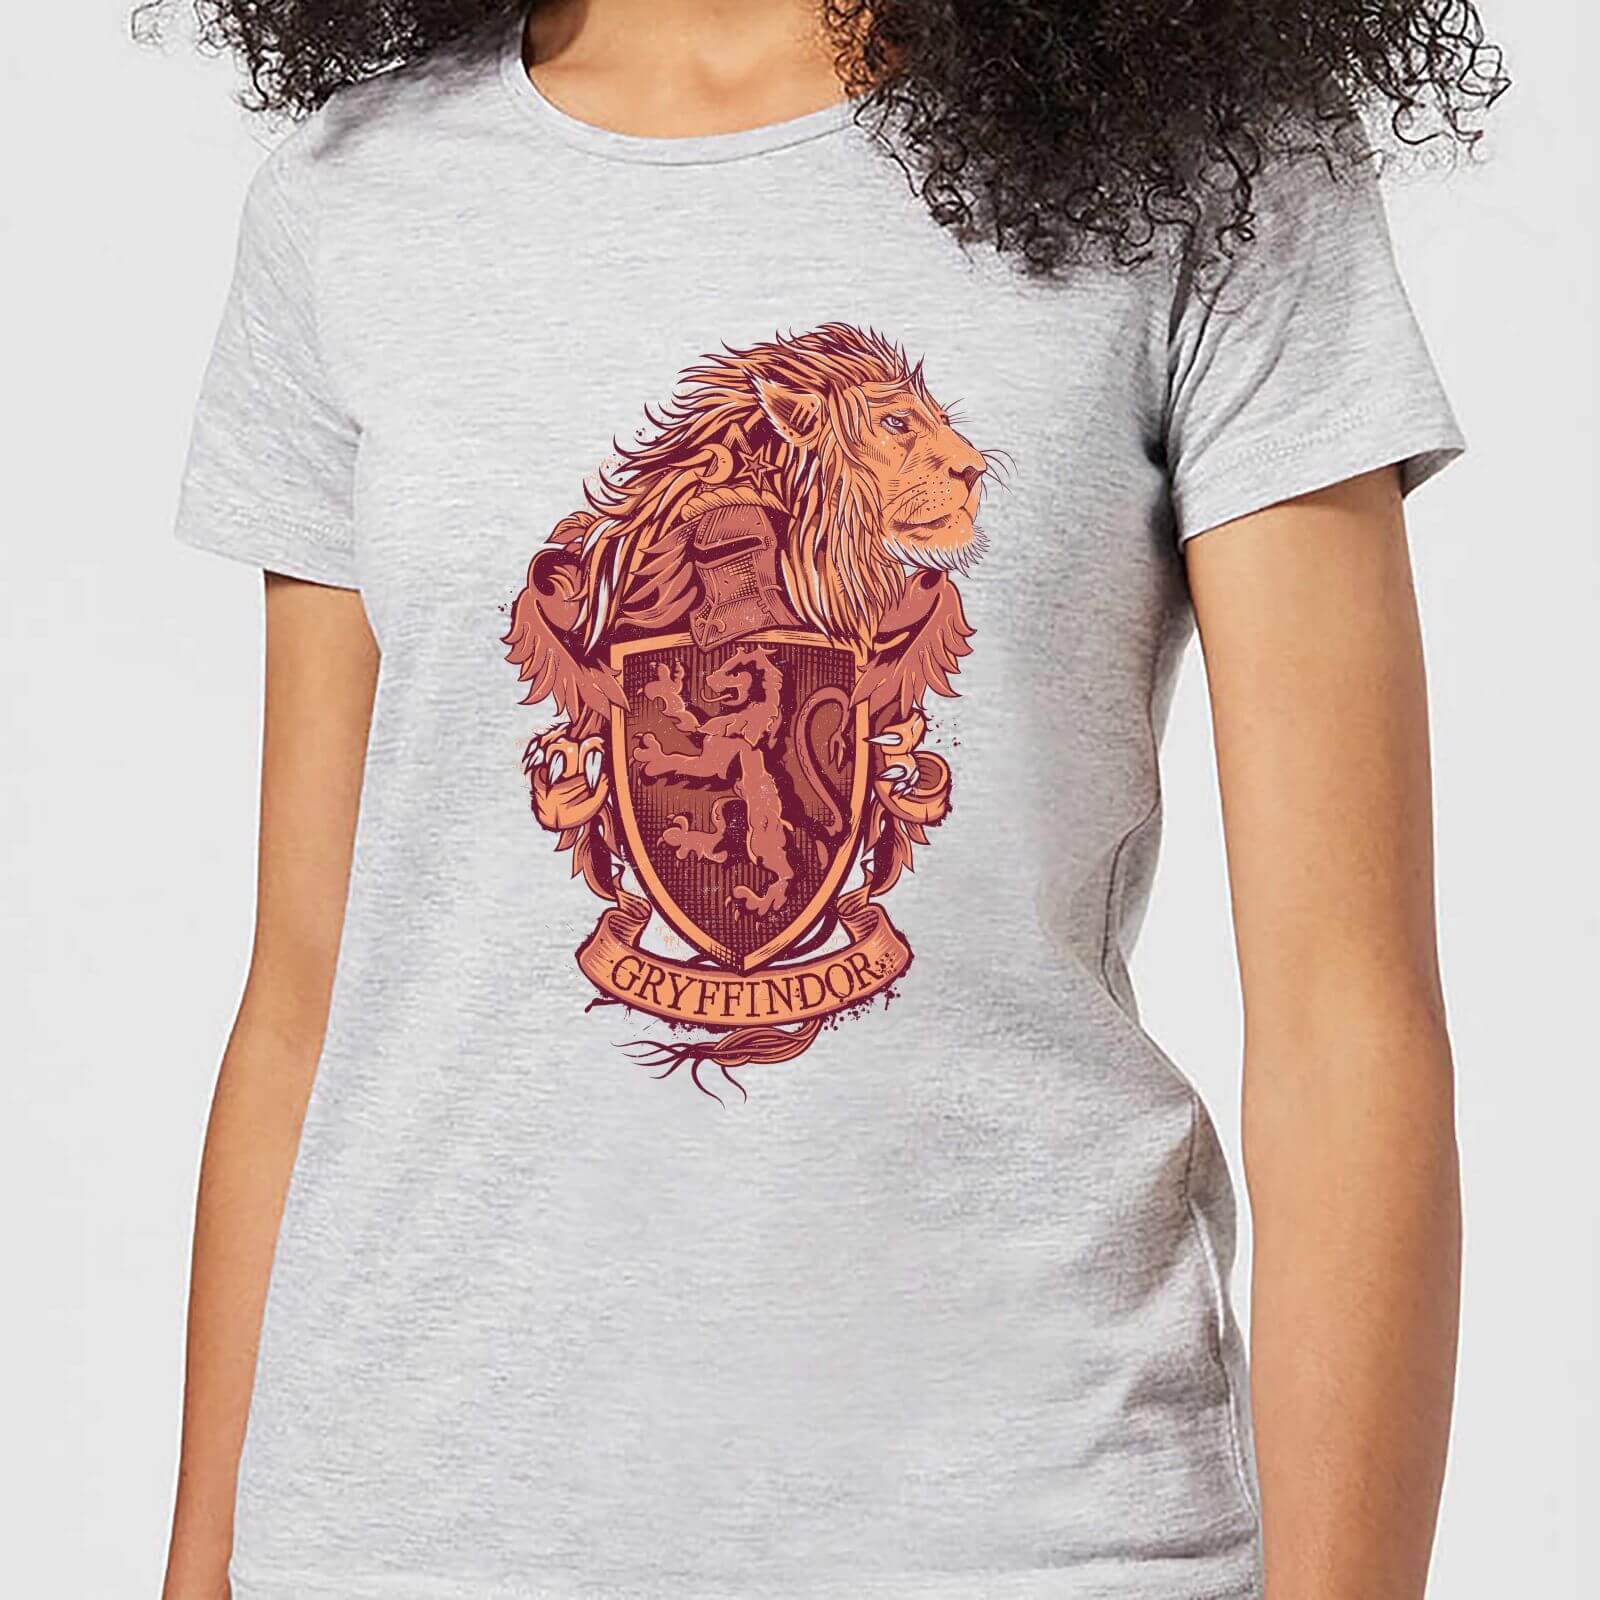 Harry Potter Gryffindor Drawn Crest Women's T-Shirt - Grey - M - Gris